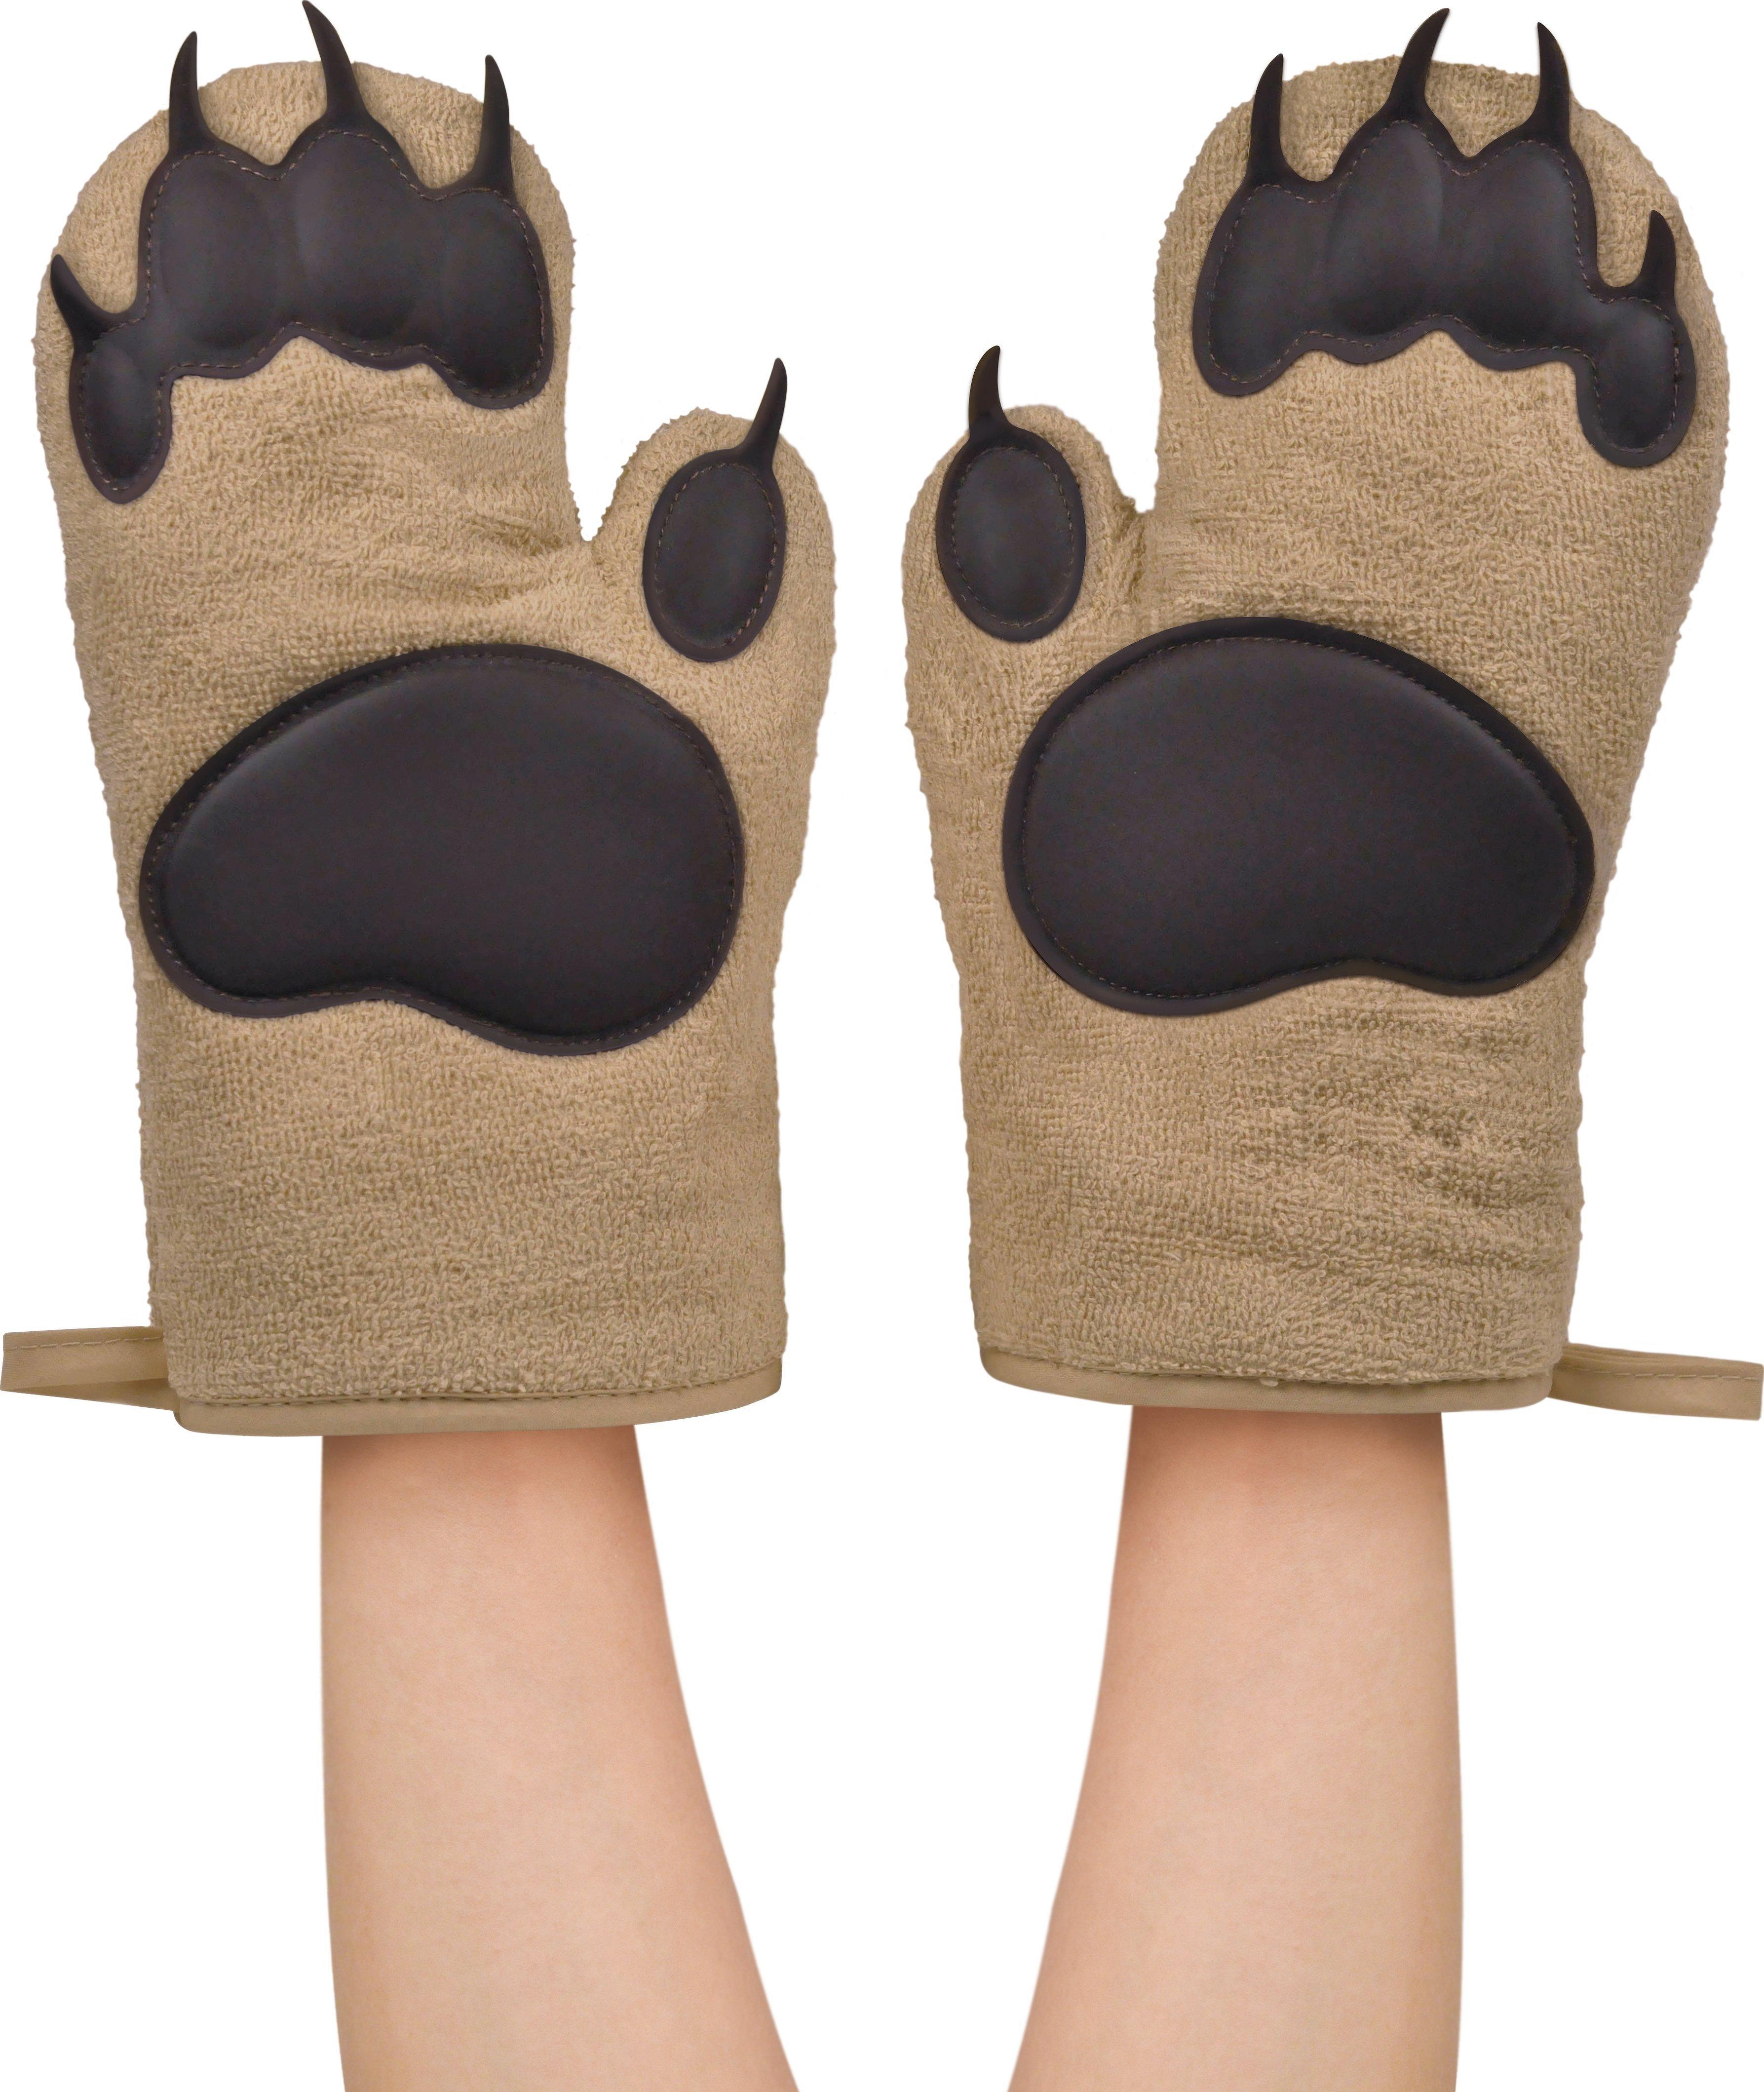 Кухонные рукавички медвежьи лапы